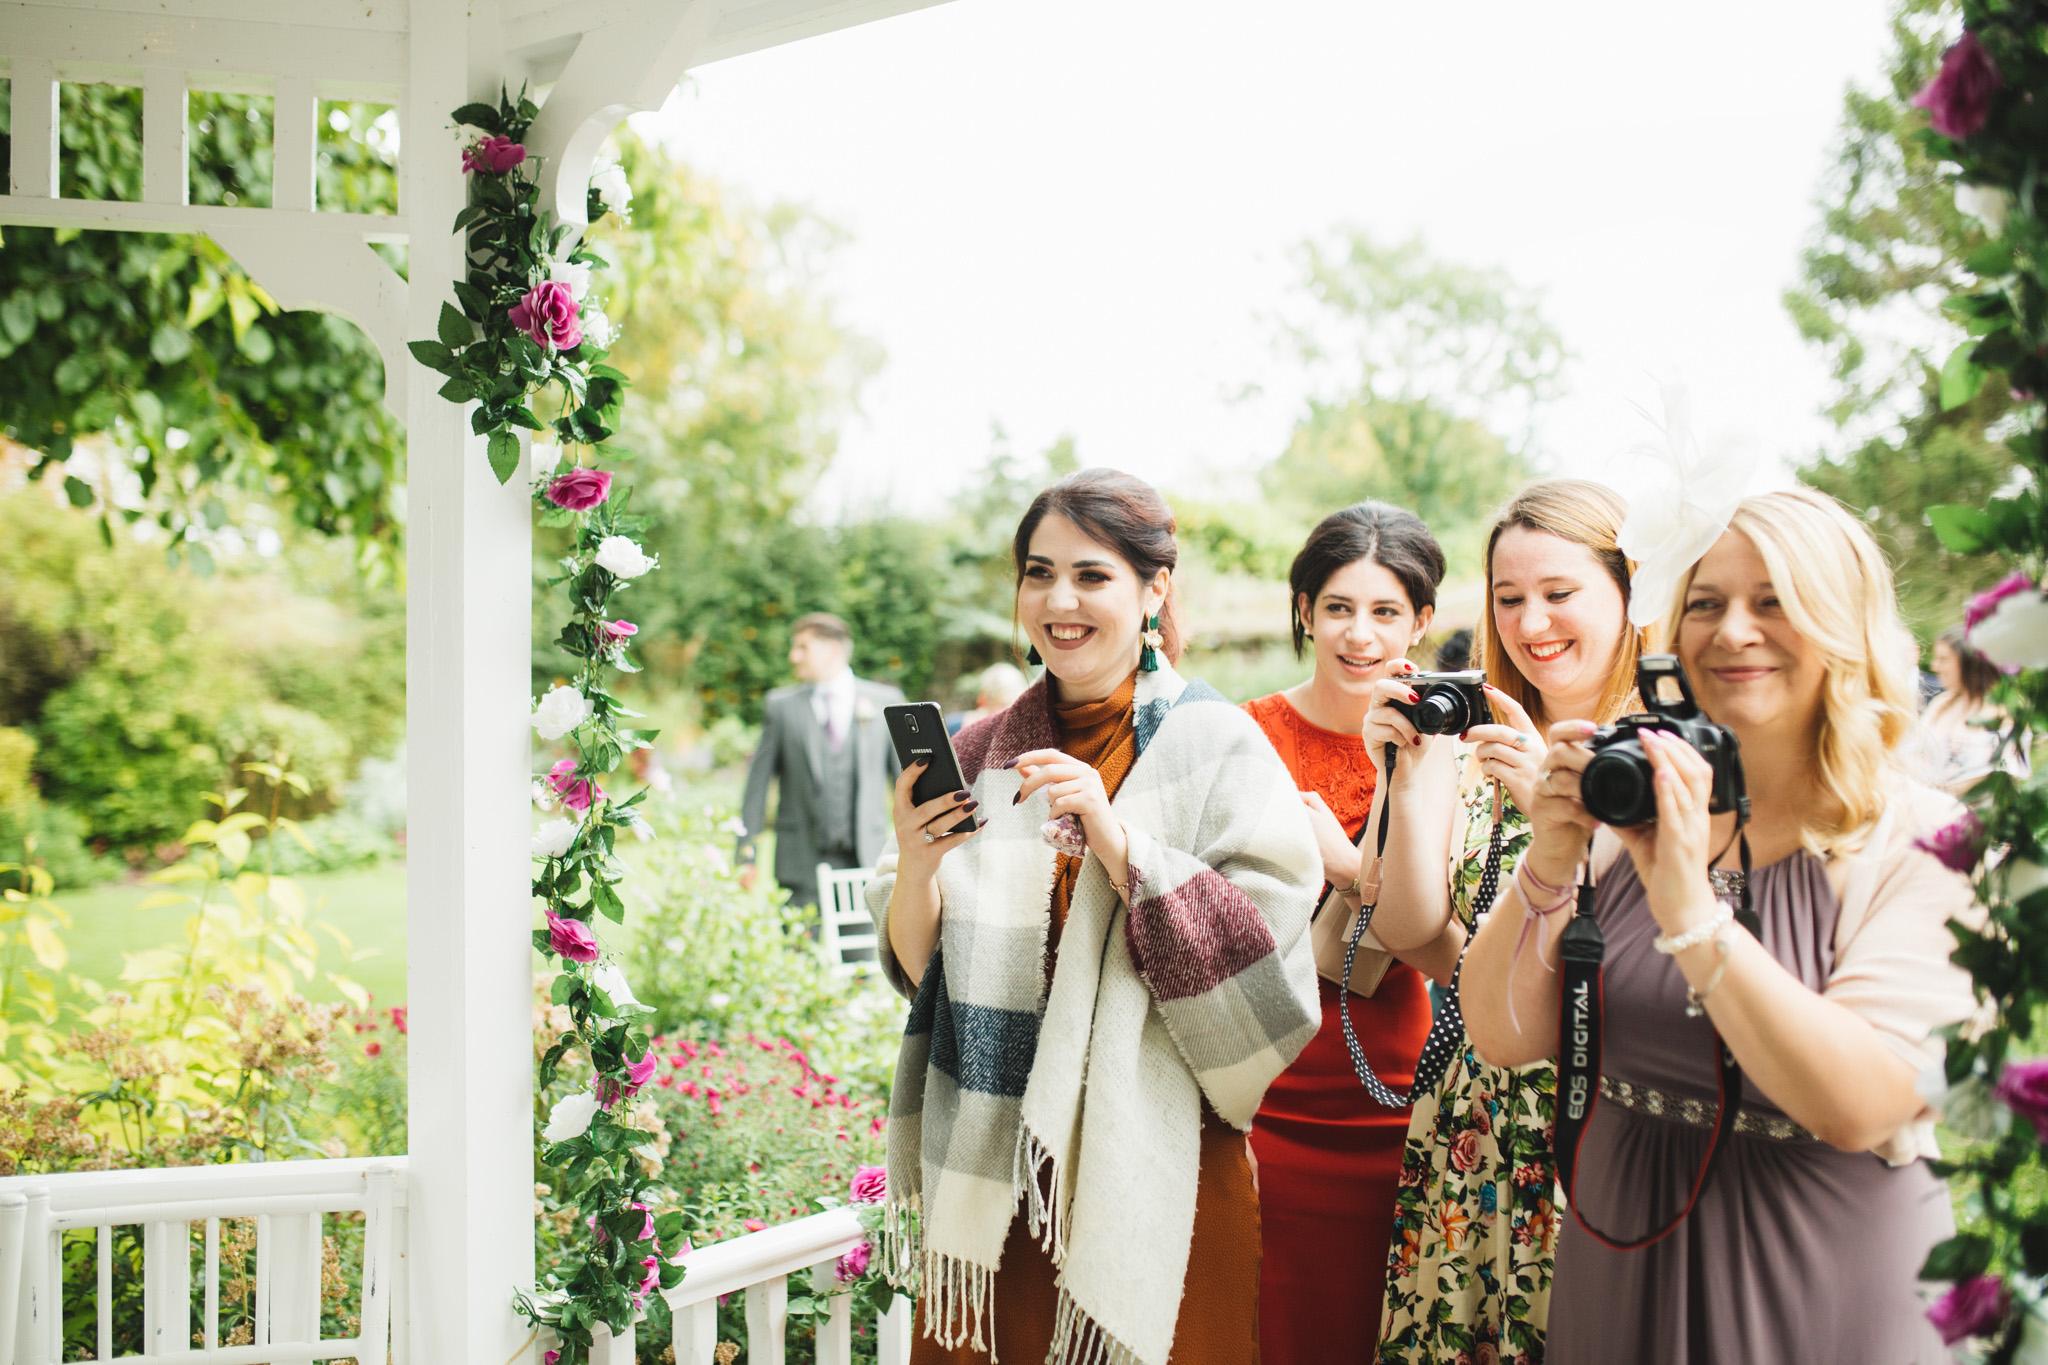 cat-lane-weddings__sheene-mill-wedding-photography__clw__1434__38A7742.jpg